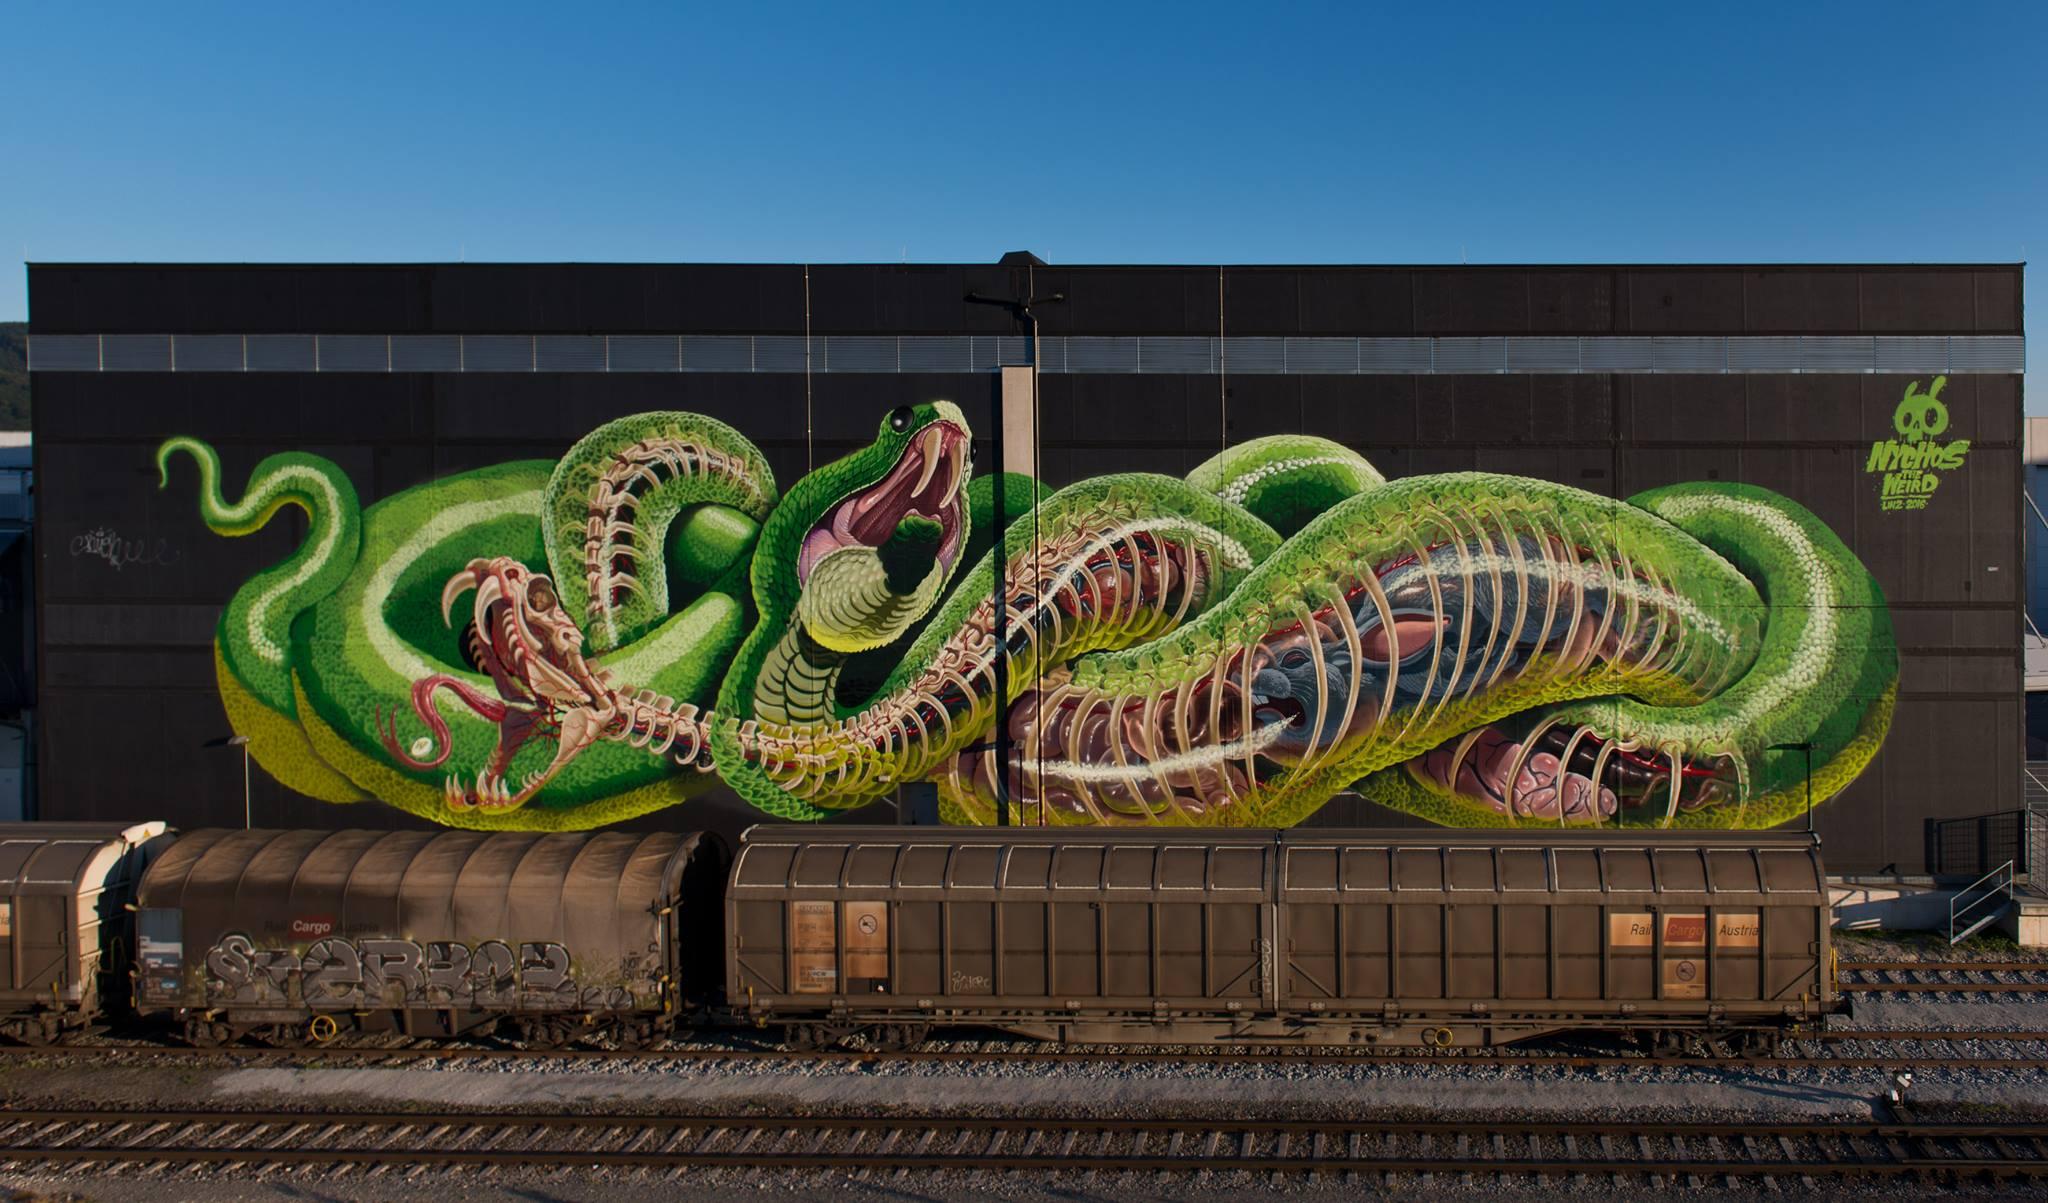 HD Quality Wallpaper | Collection: Artistic, 2048x1203 Street Art